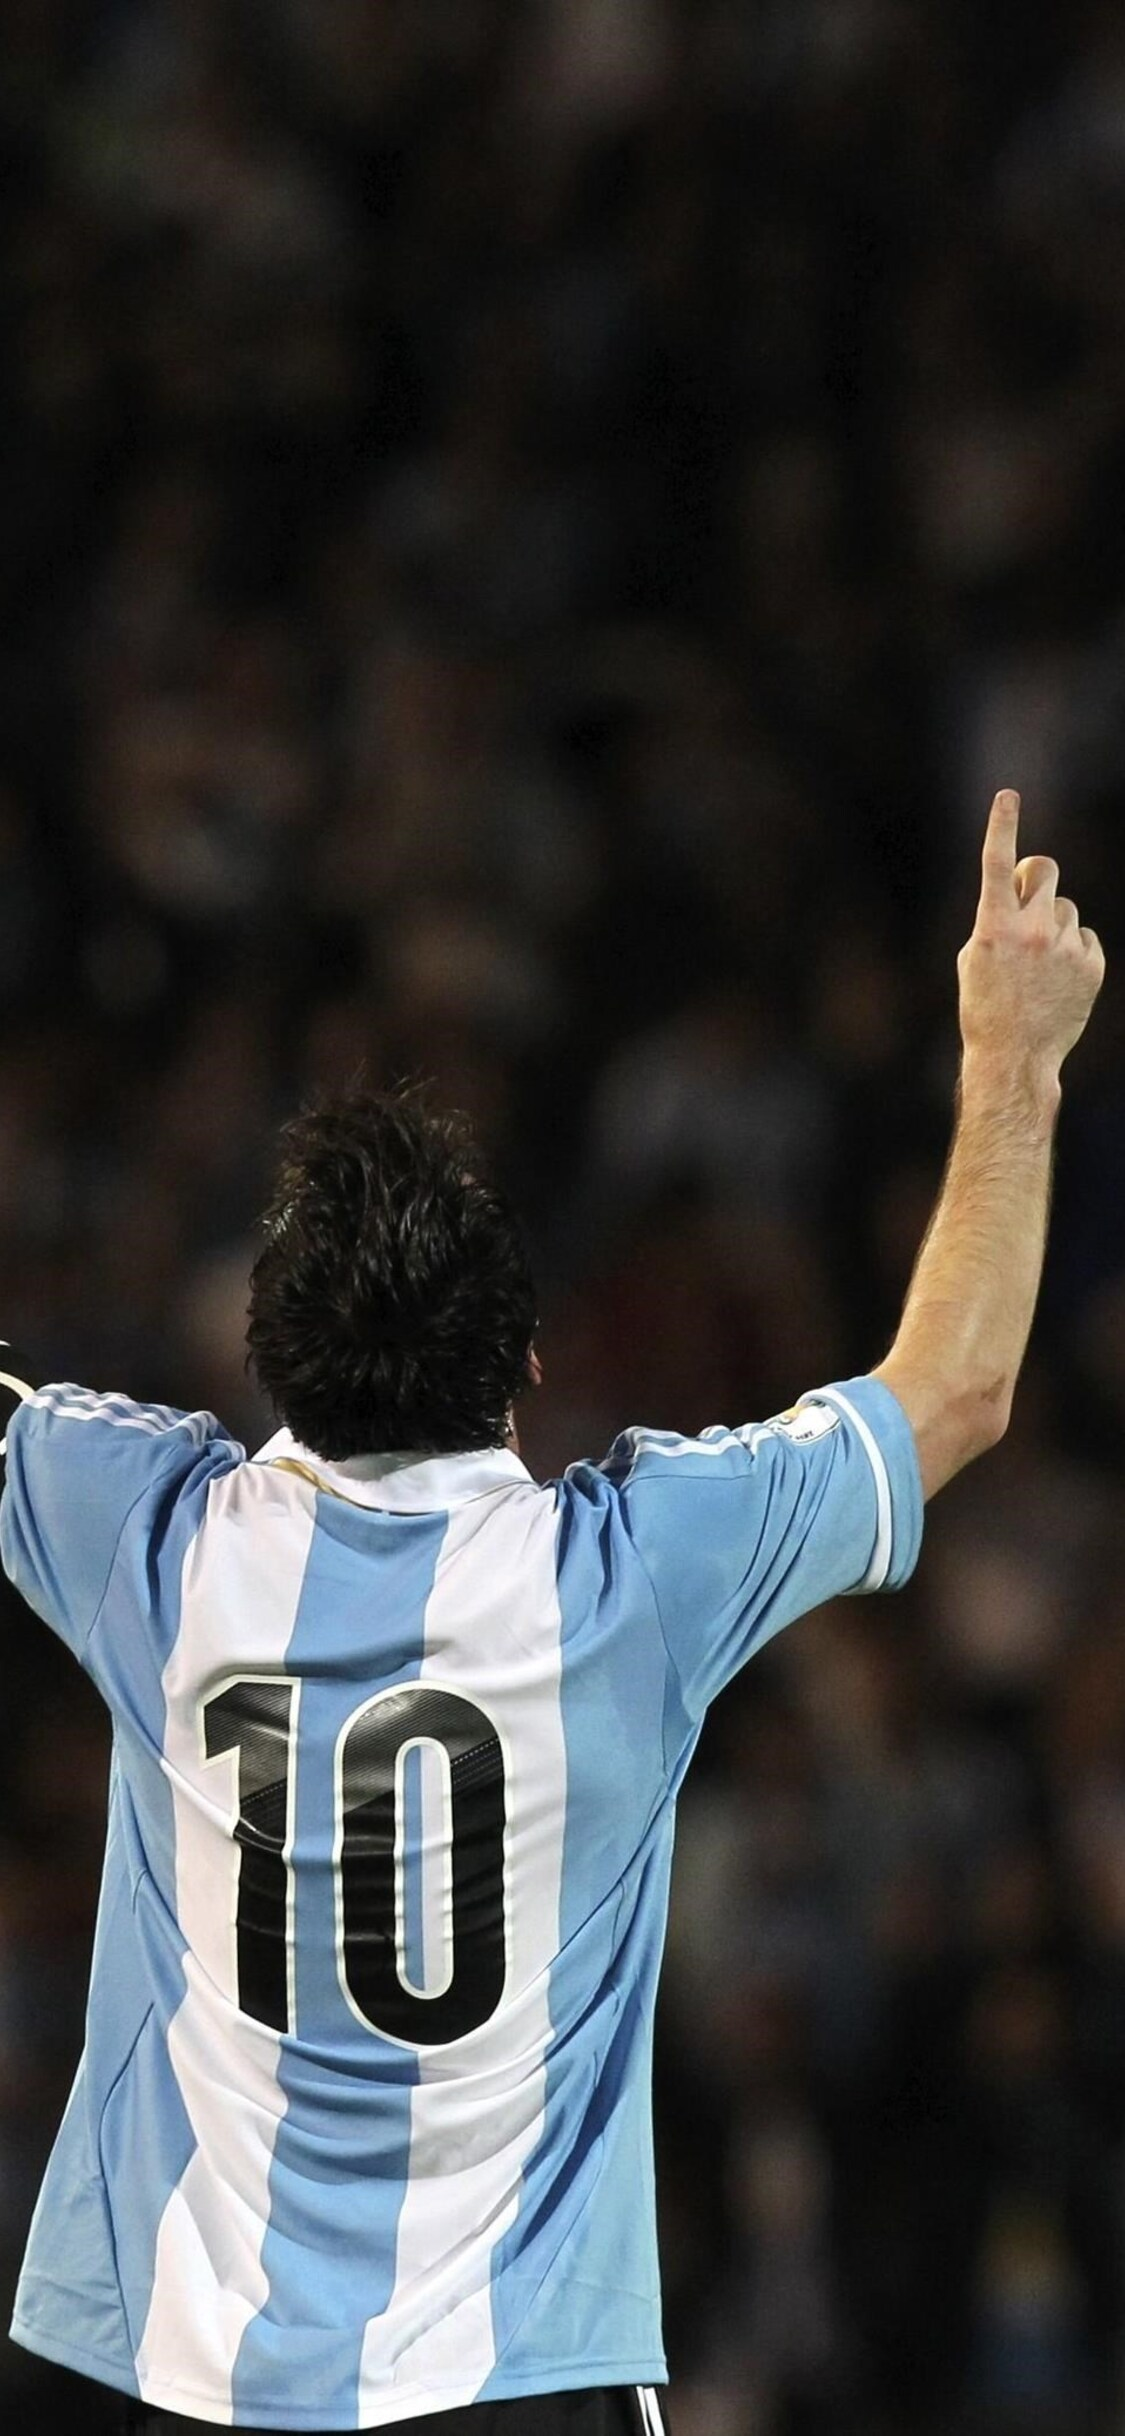 1125x2436 Leo Messi Argentina Iphone Xs Iphone 10 Iphone X Hd 4k